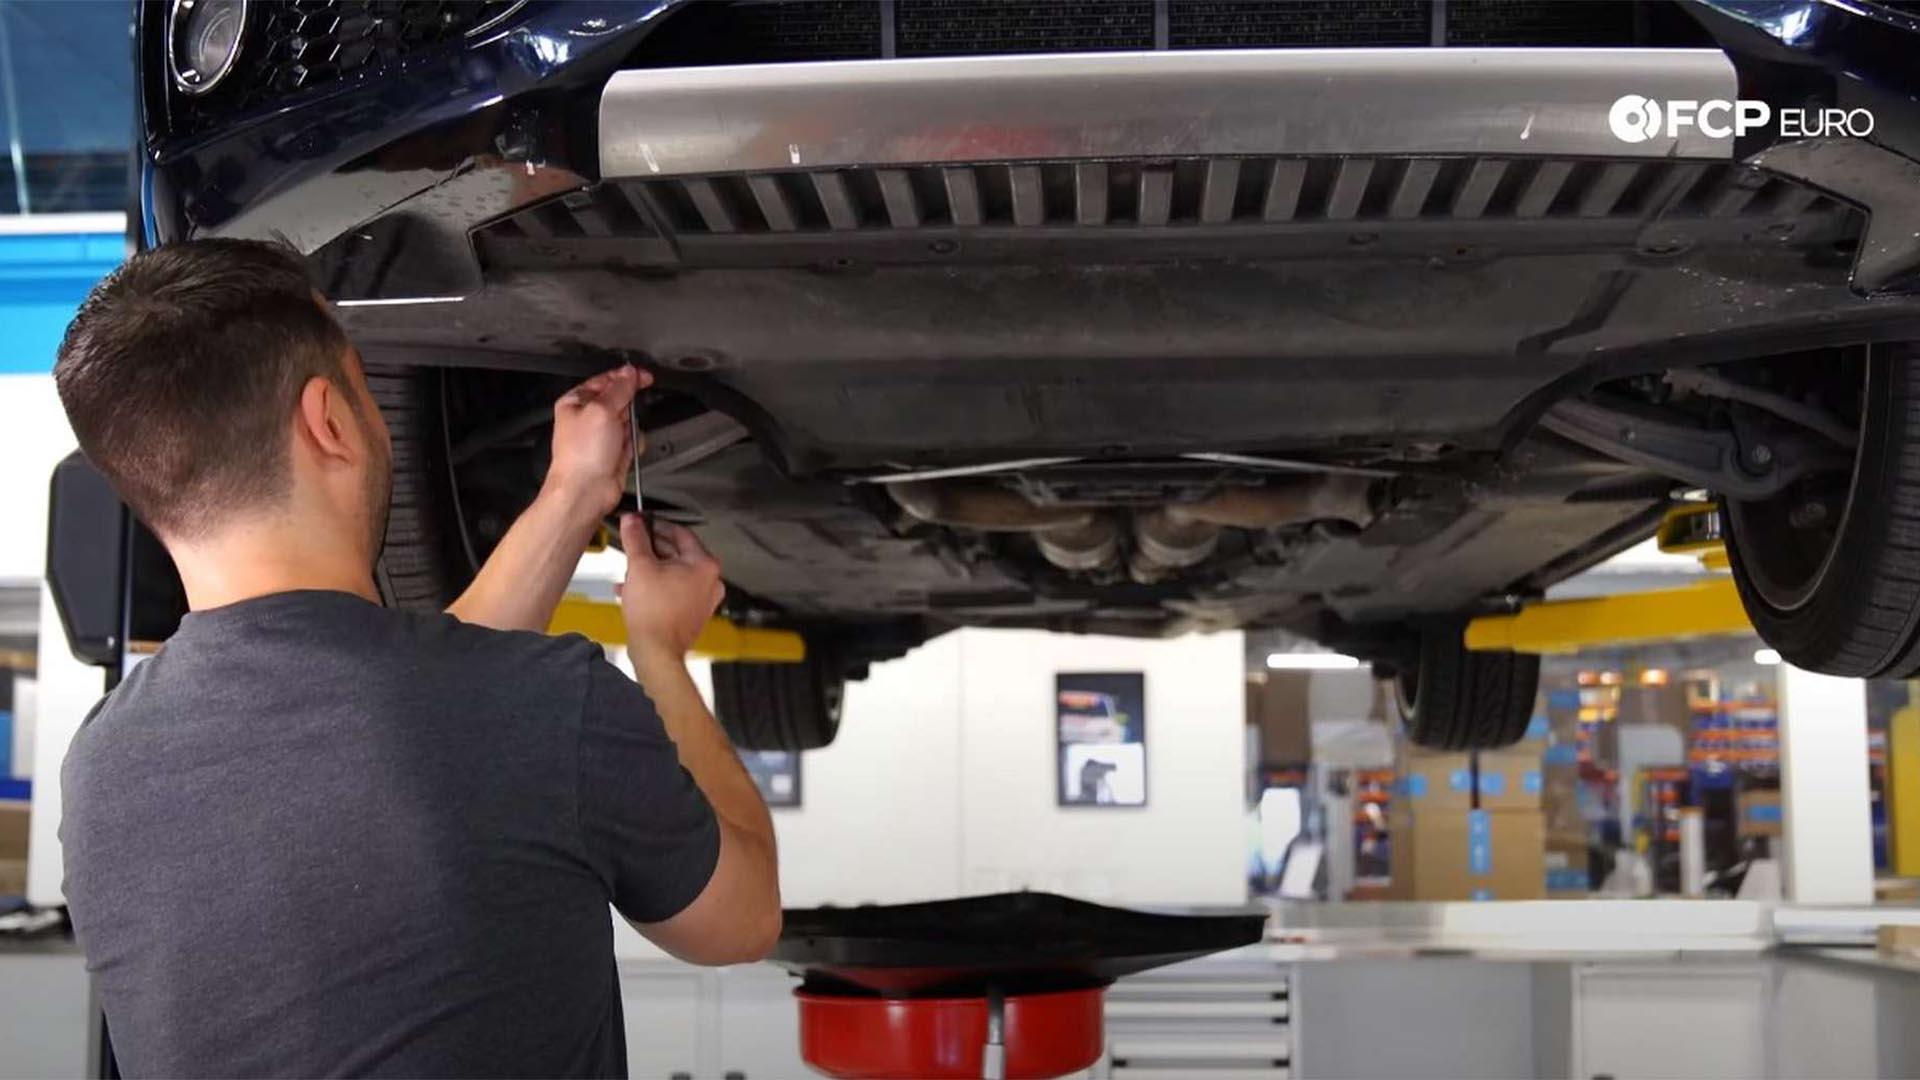 How To Change The Oil In An Audi S5 (Audi B8/B8.5 4.2 L V8)